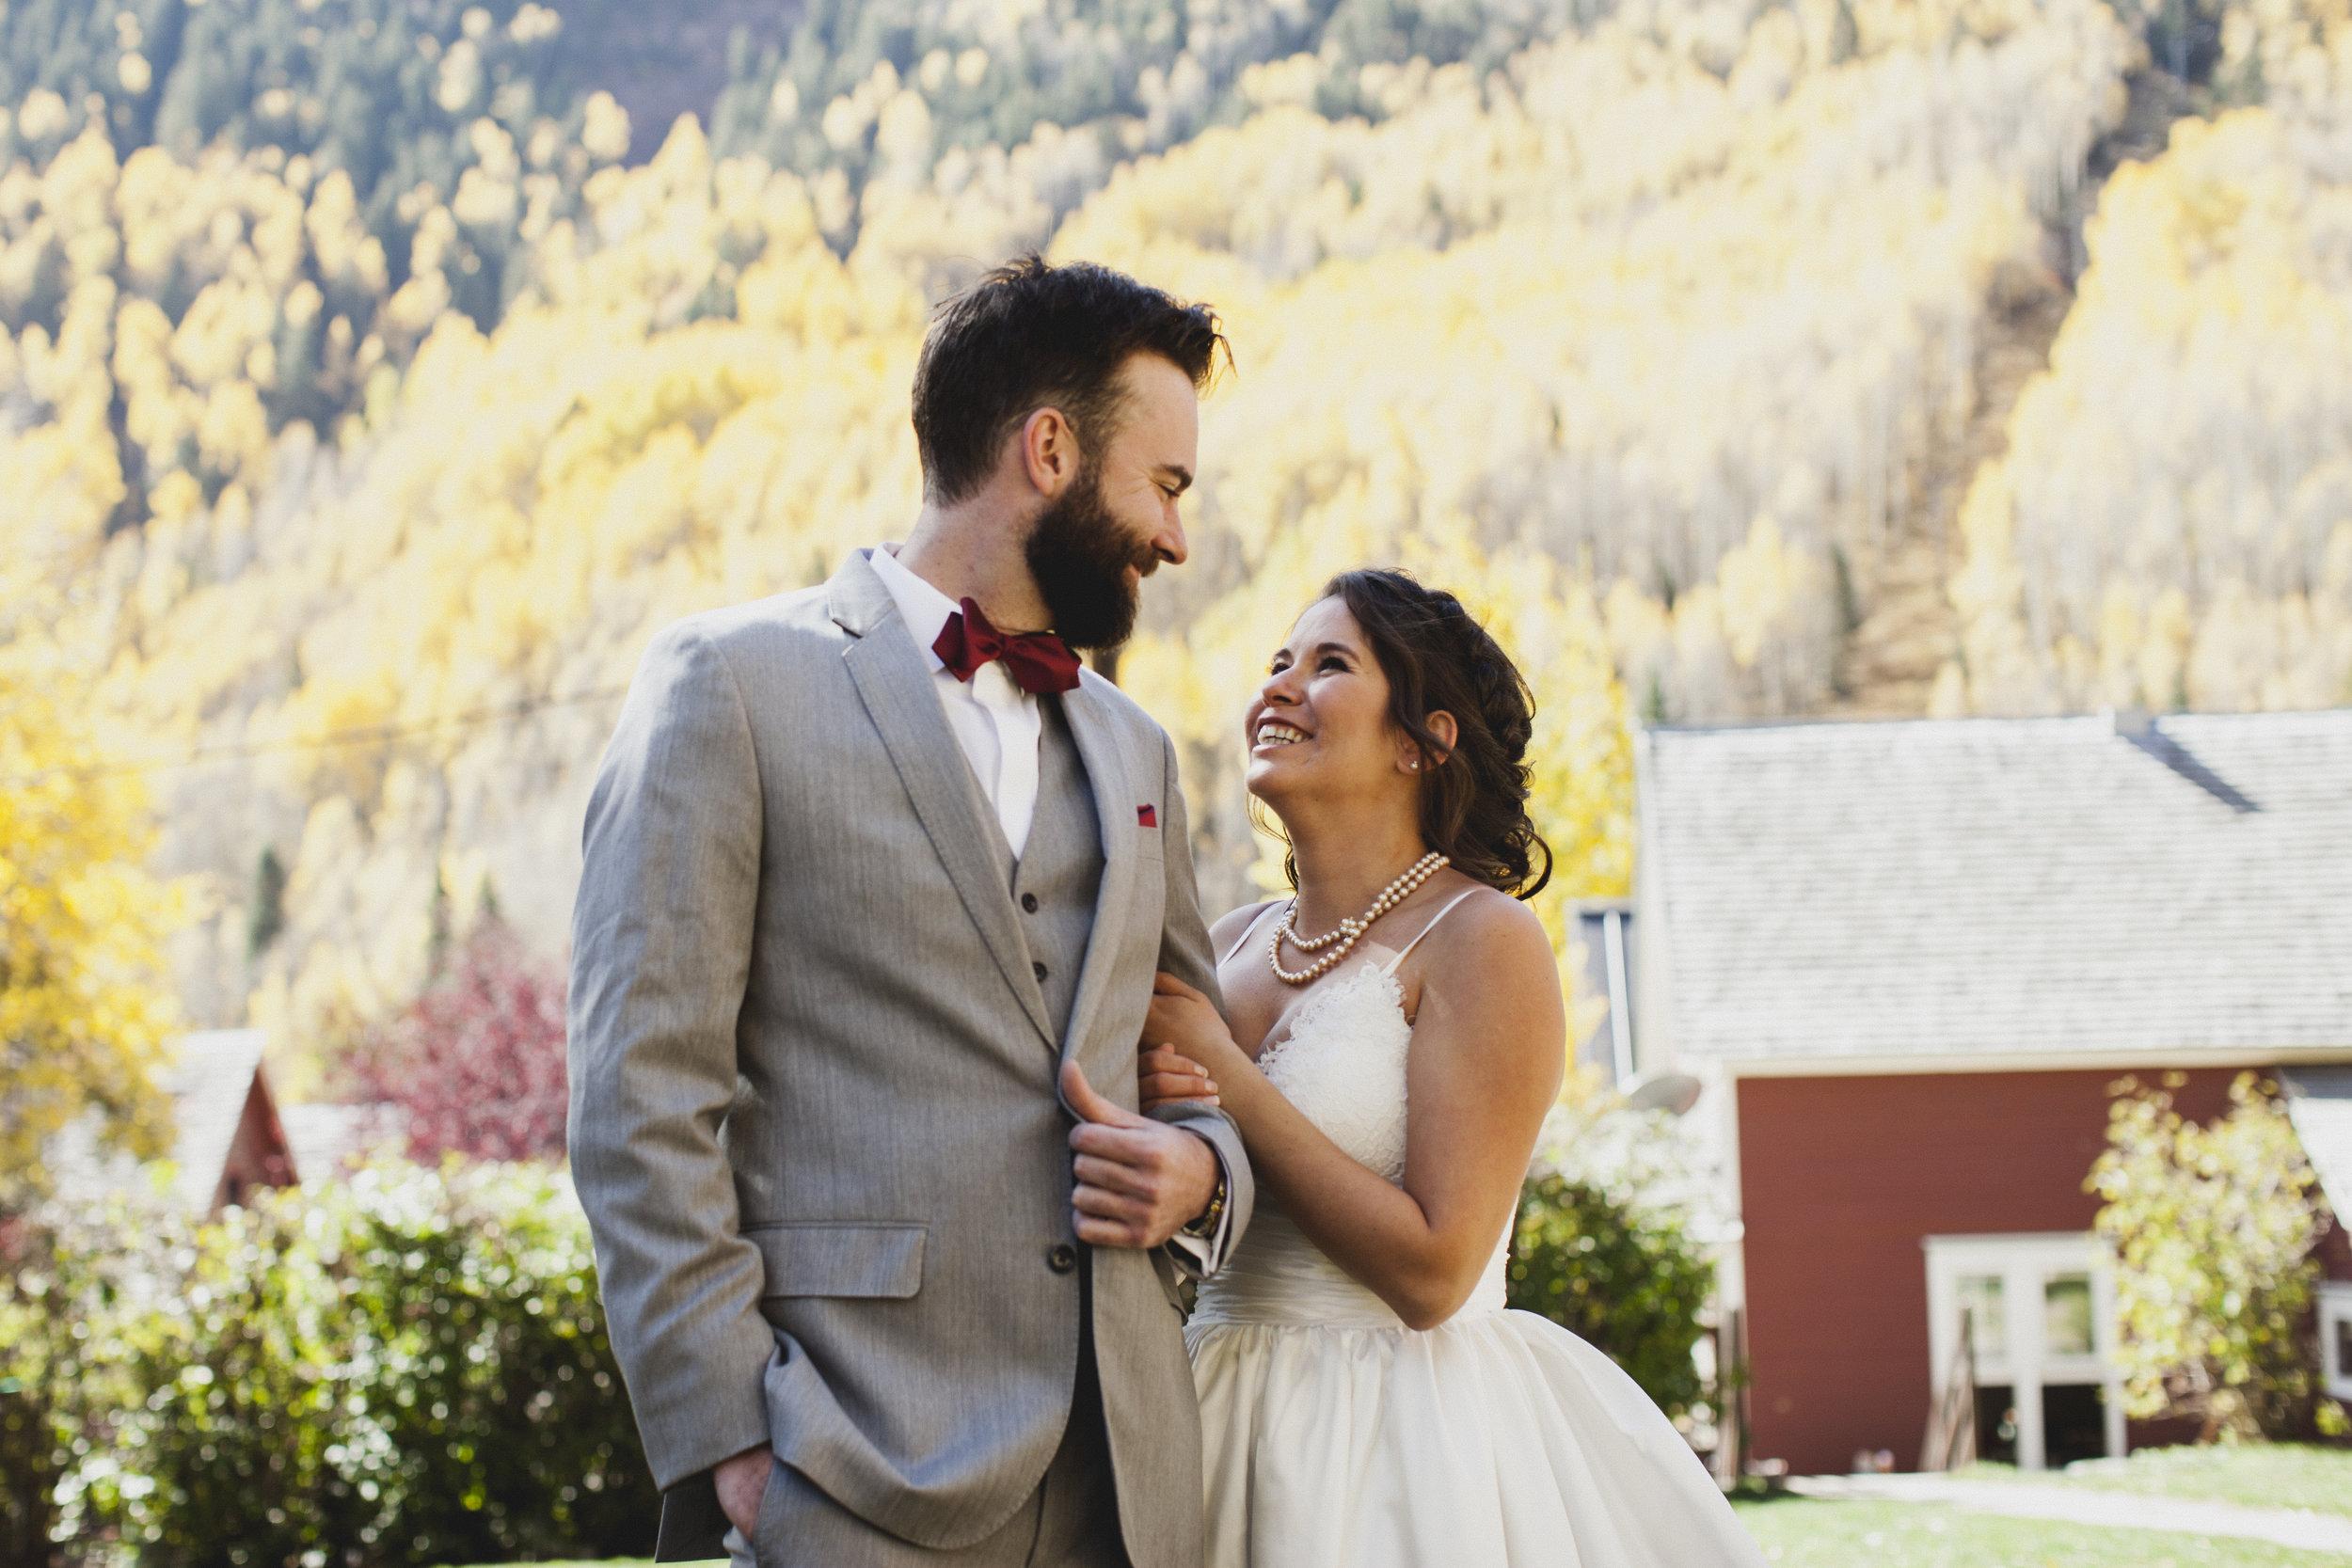 NE-LeahandAshtonphotography-Telluride-Wedding-Photography-6521.jpg